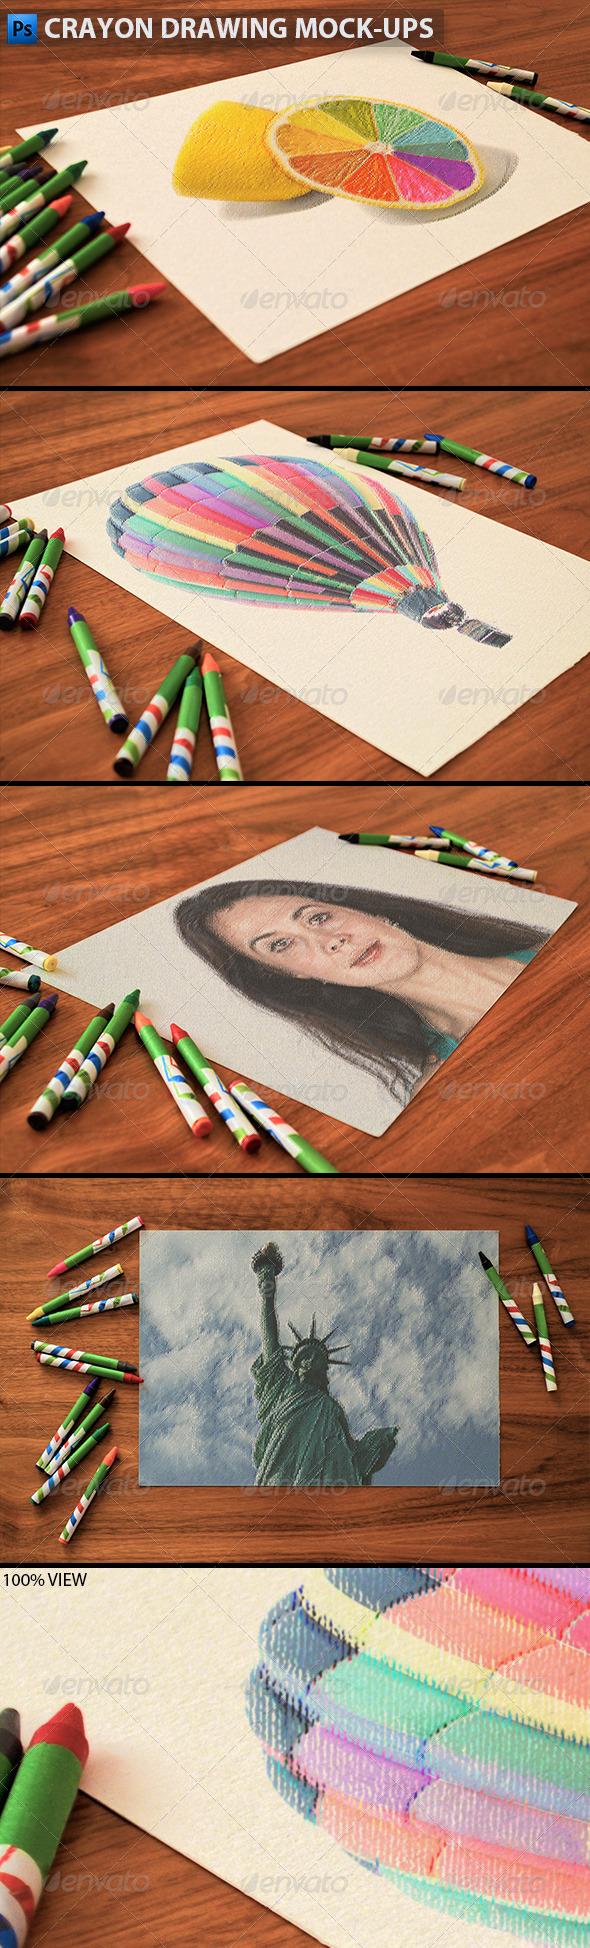 GraphicRiver Crayon Drawing Mock-ups 6110766